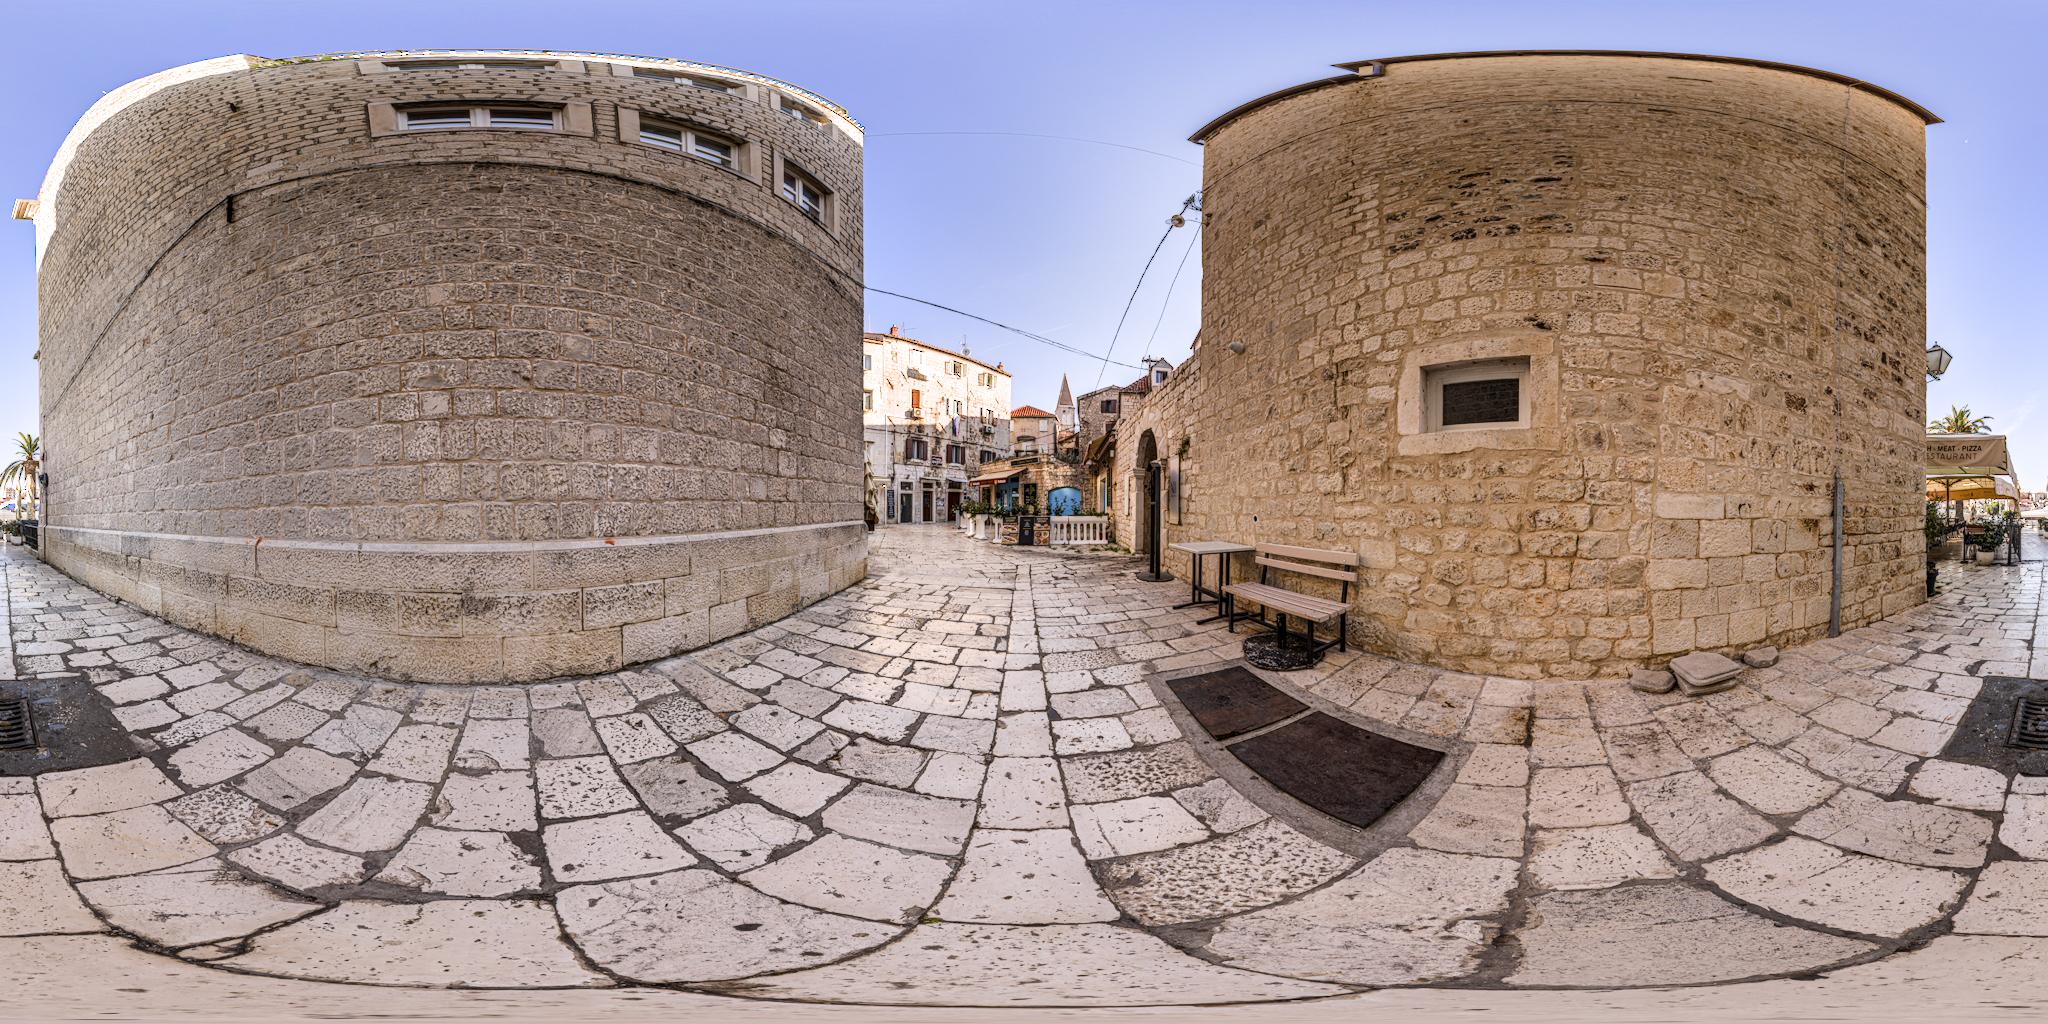 HDRI-Skies-Mornarska-Ulica-Alley-Trogir